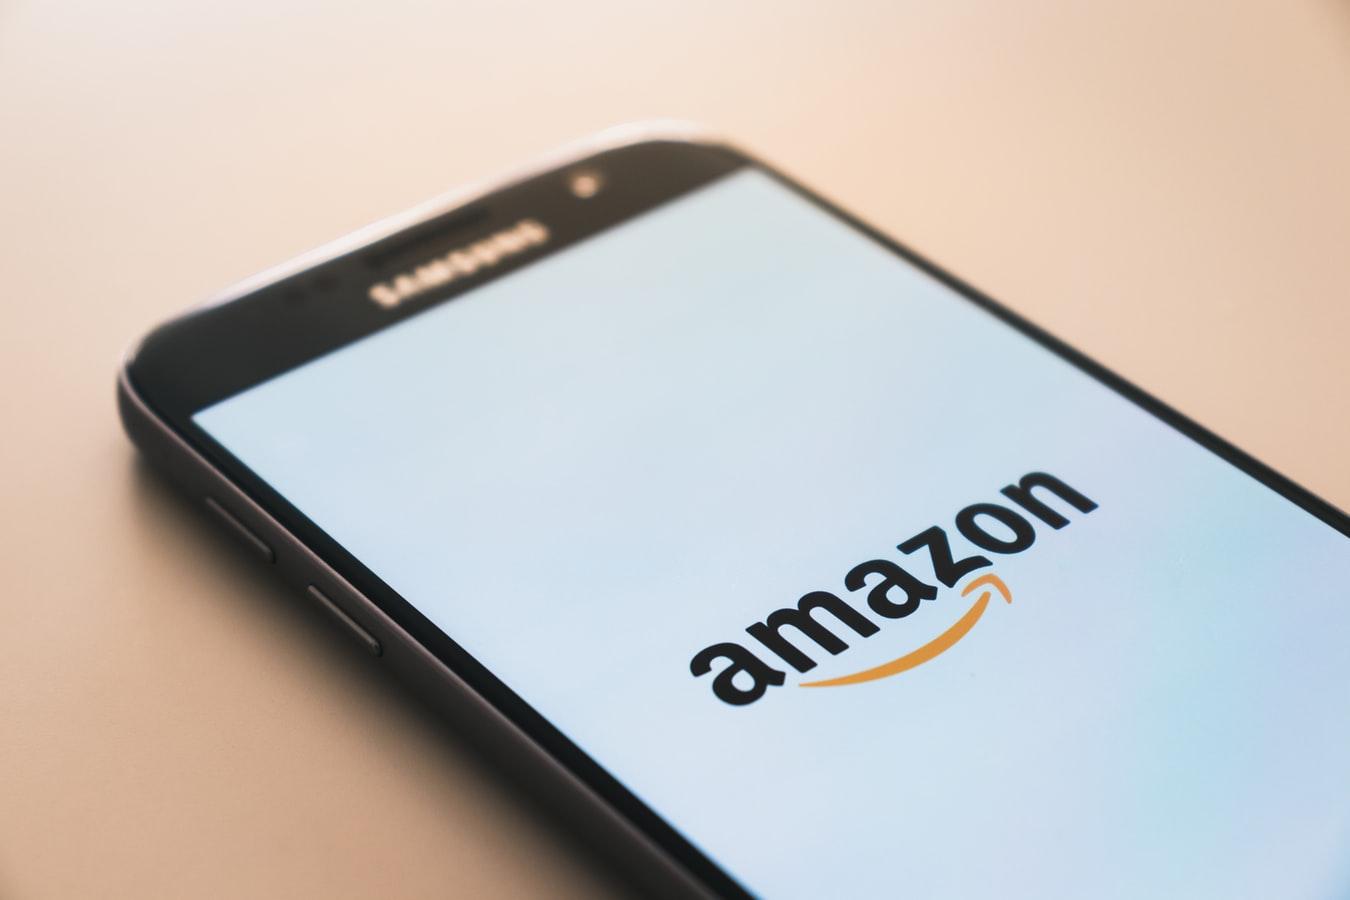 Amazonプライムはかなりお得です【使い方次第で簡単に元が取れます】